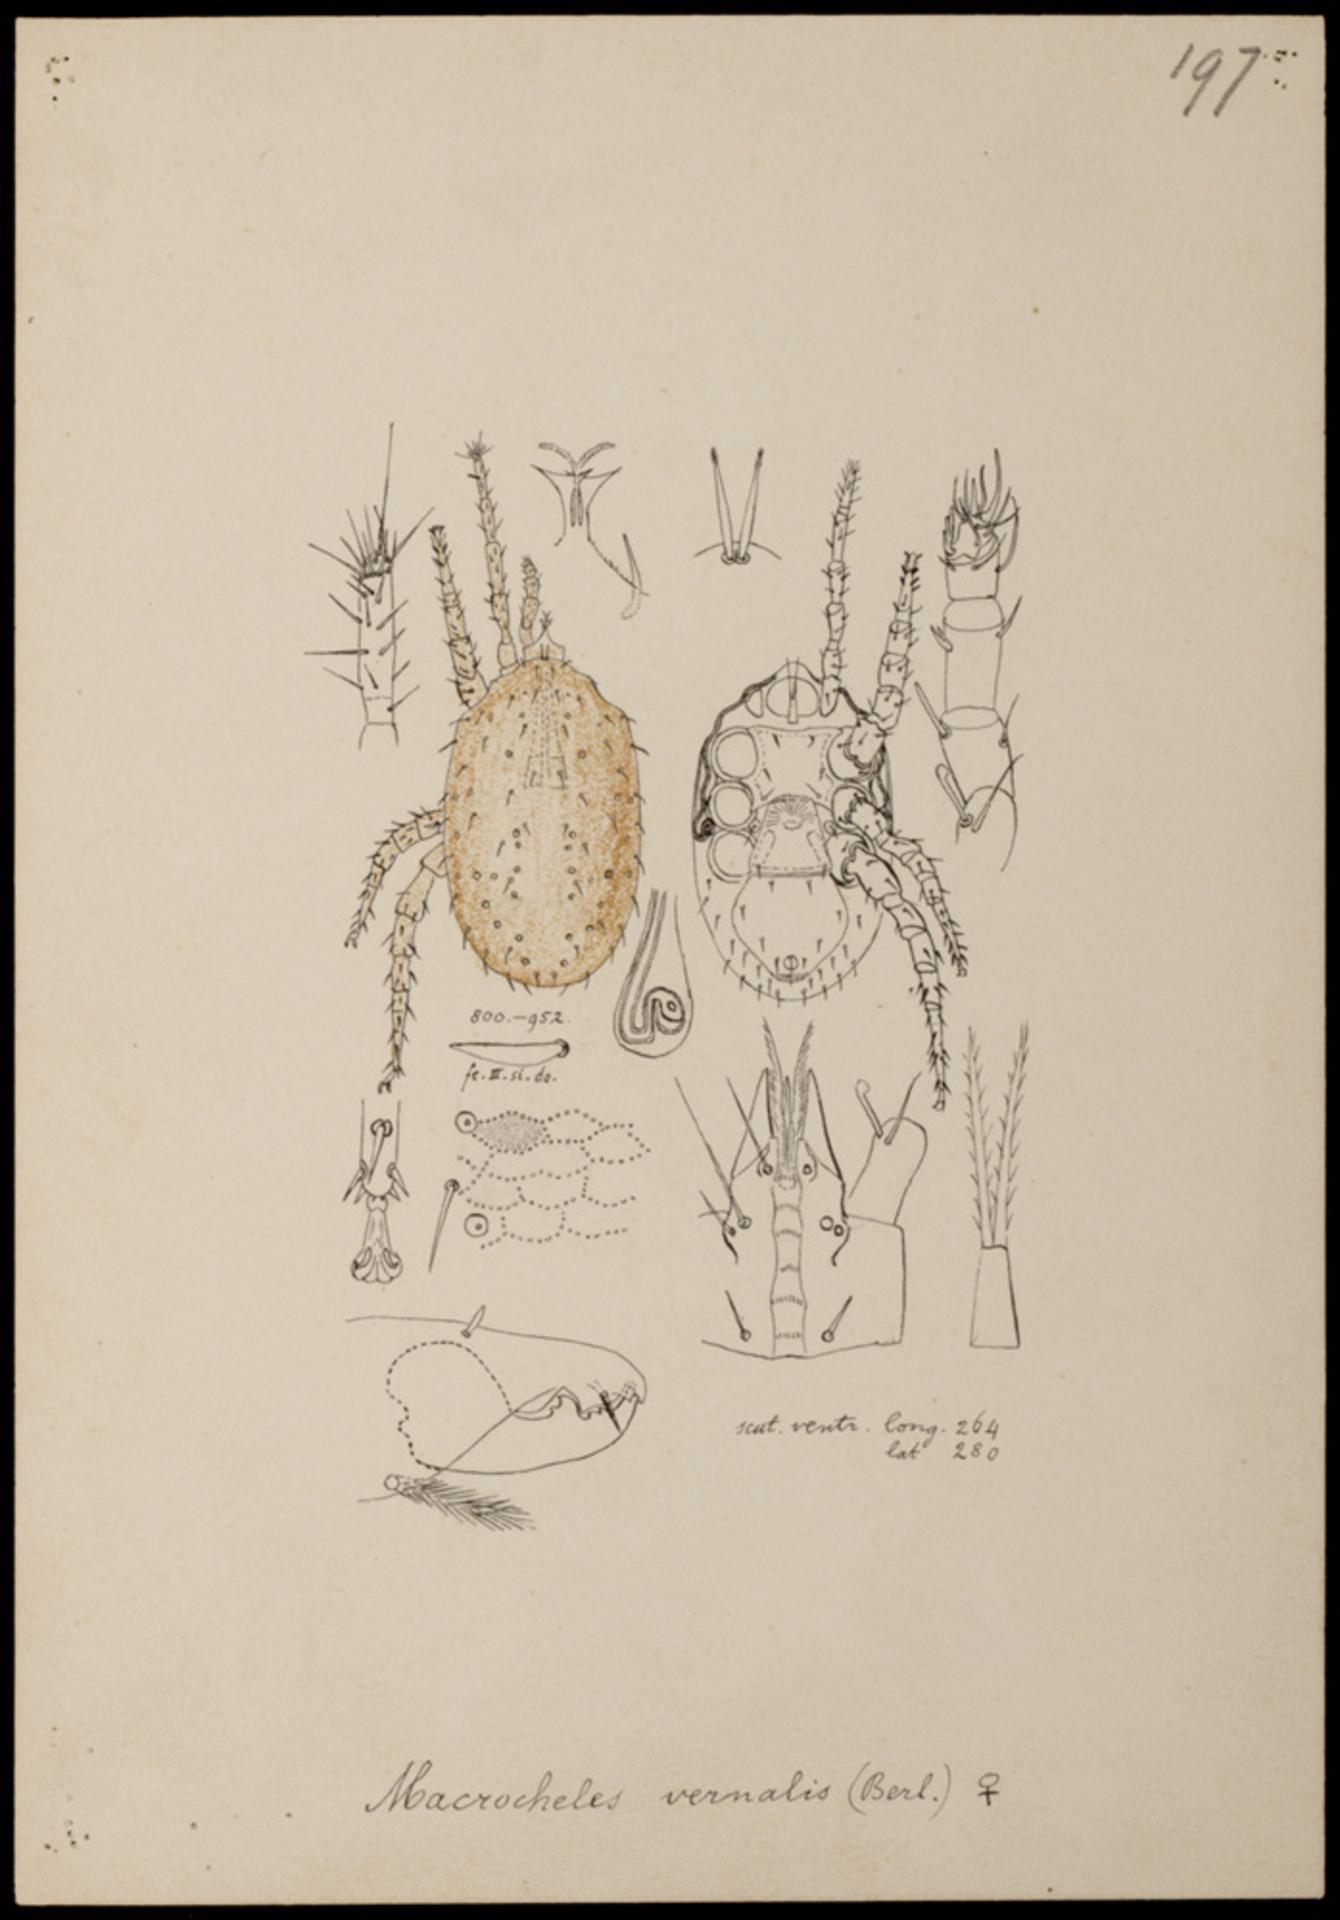 RMNH.ART.1047 | Macrocheles vernalis (Berlese)